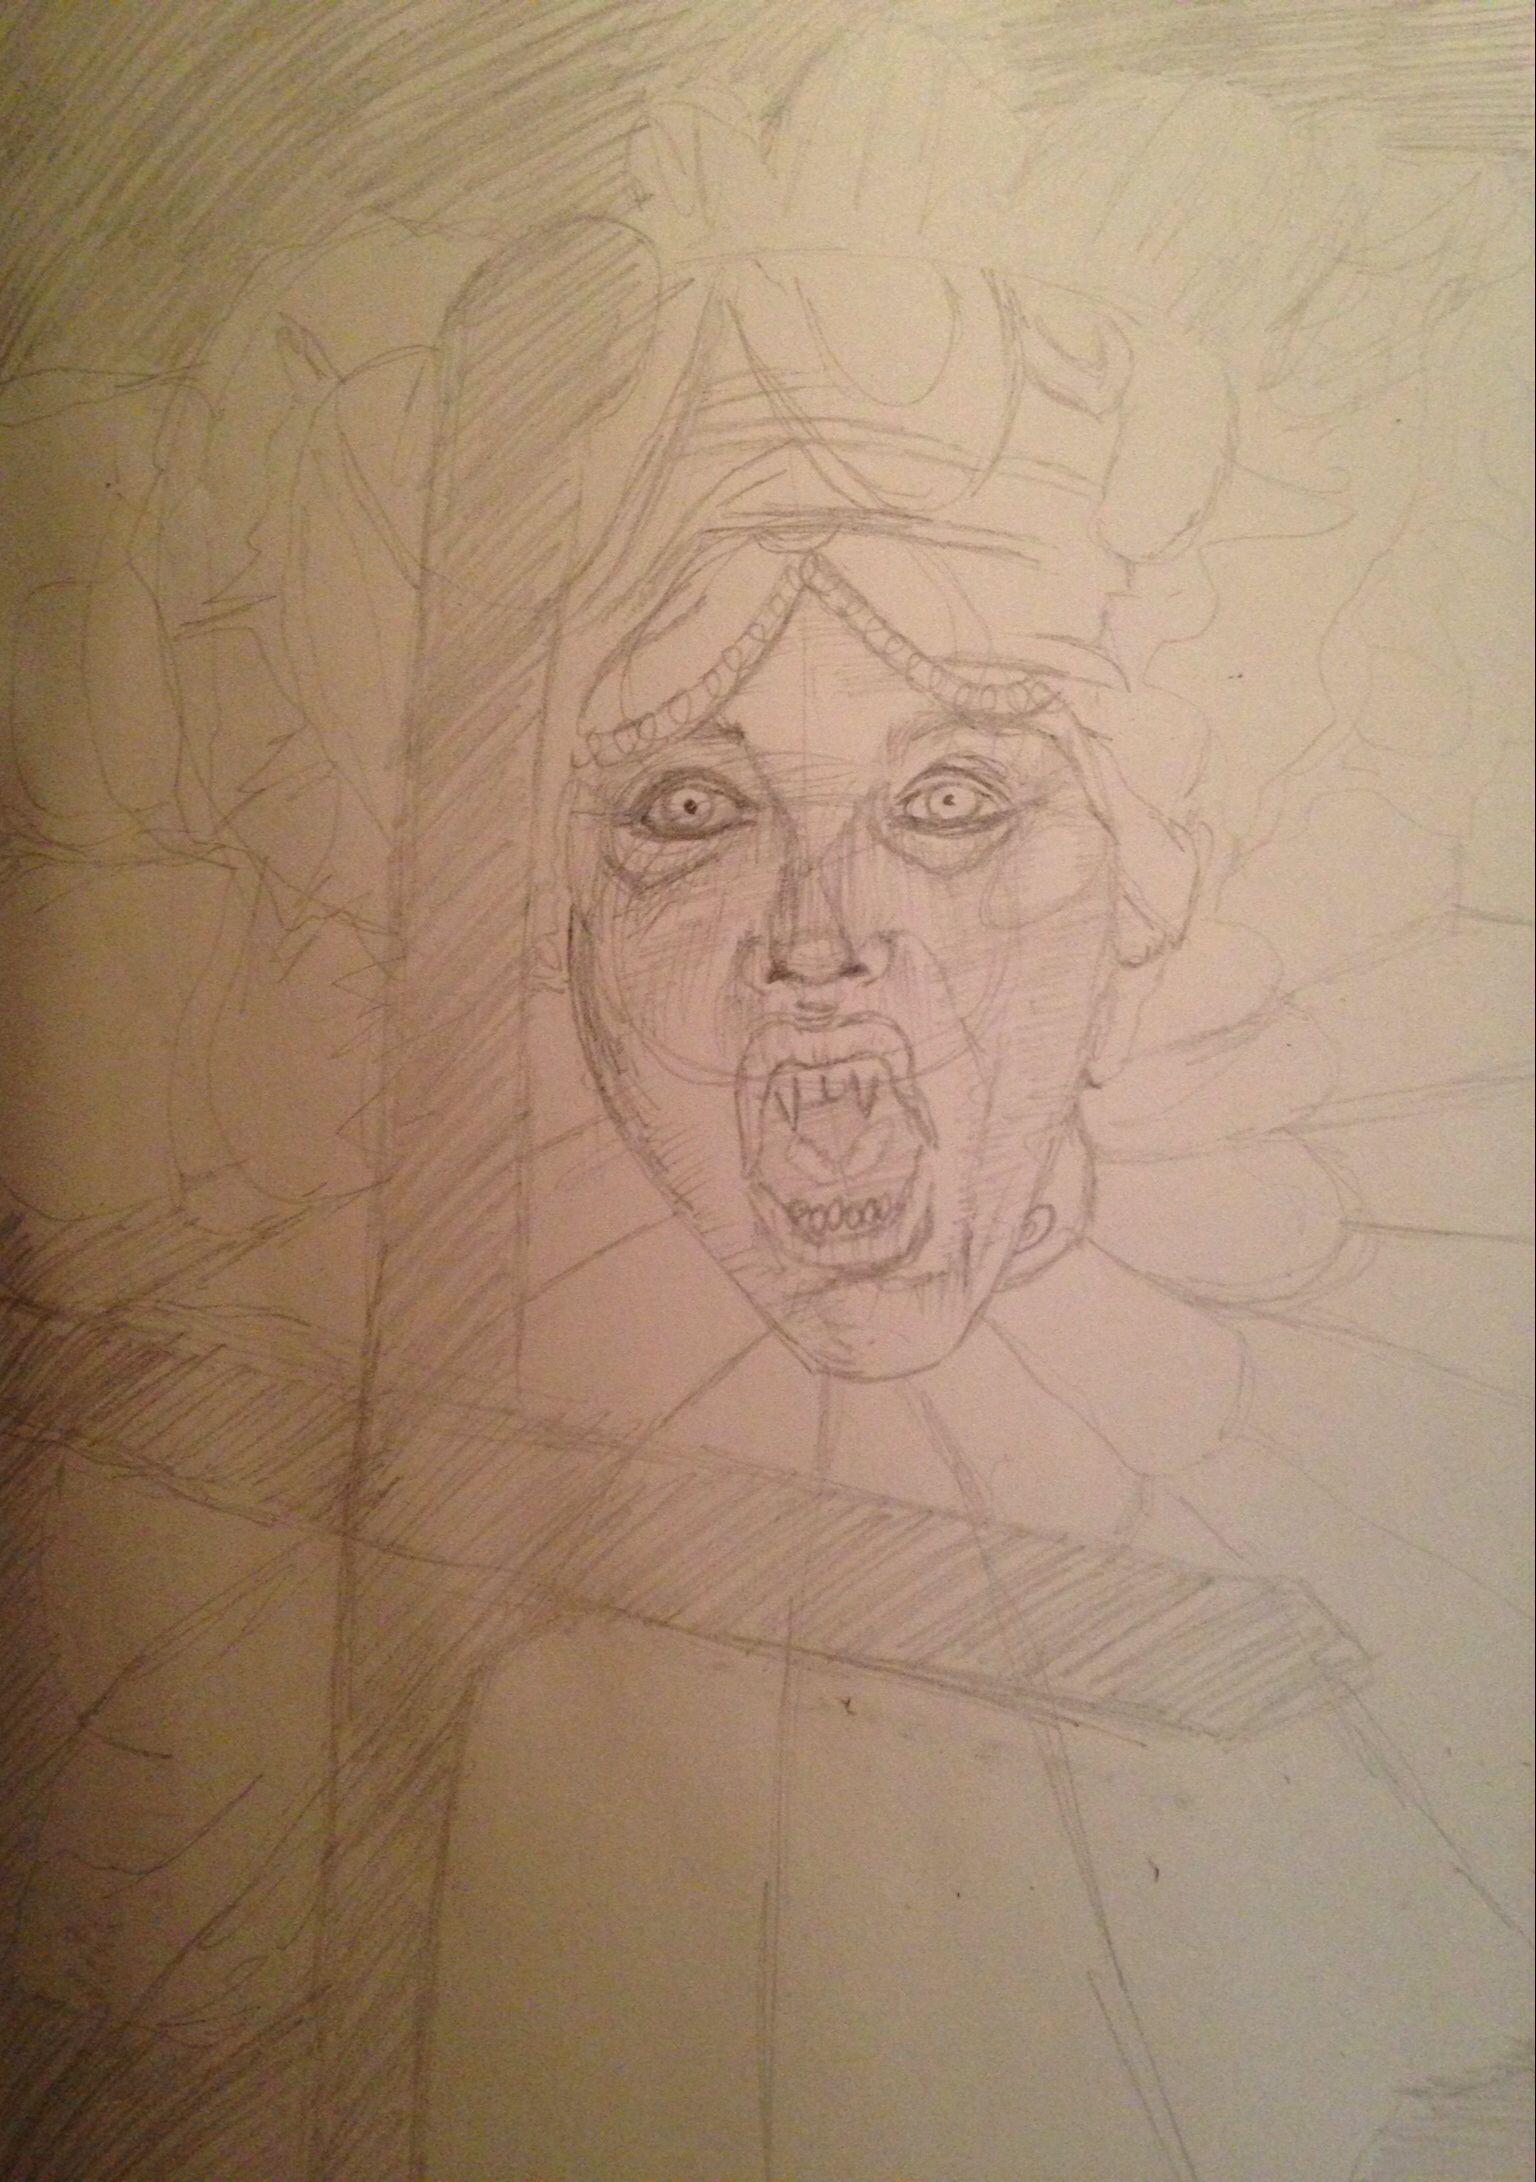 #inprogress #pencil #lucy #dracula #coloredpencils #sadiefrost